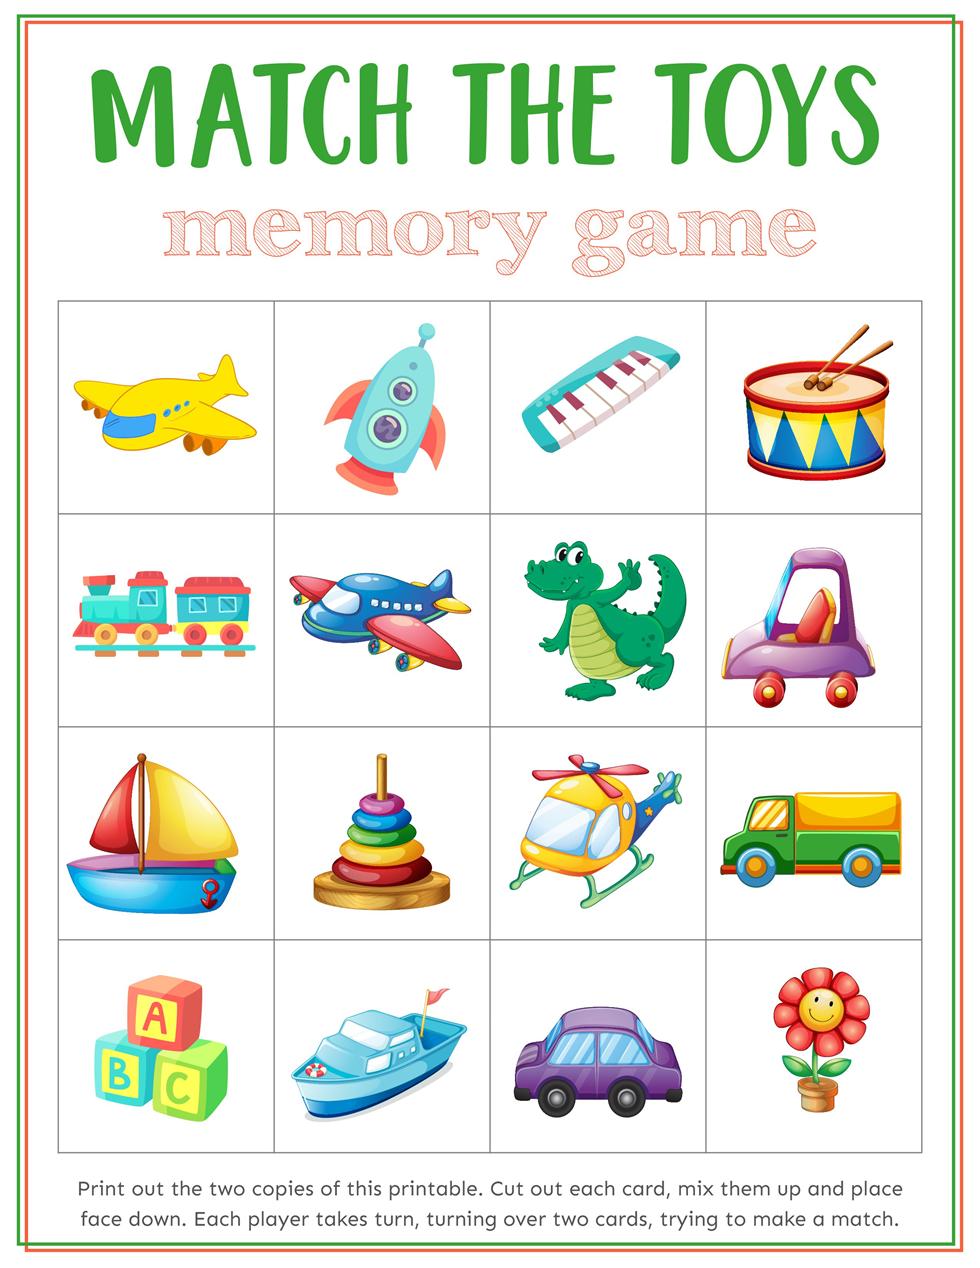 Kids Toys Memory Games Download Free Printable Memory Games Paper Games For Kids Game Download Free